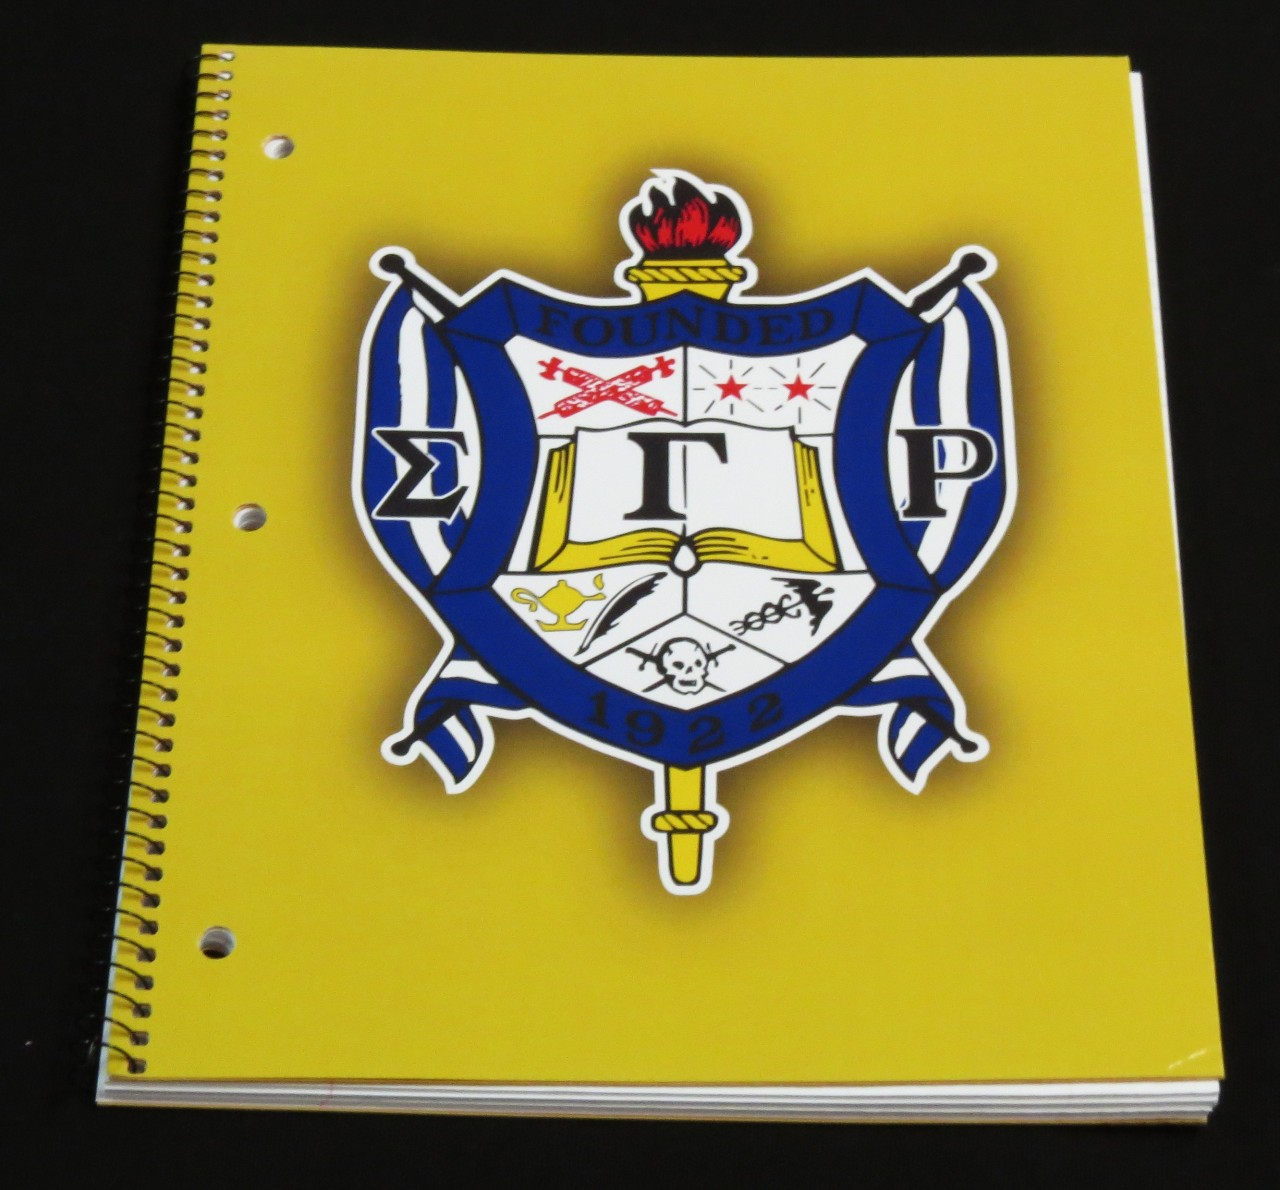 Spiral notebook sigma gamma rho the greek shop spiral notebook sigma gamma rho biocorpaavc Images